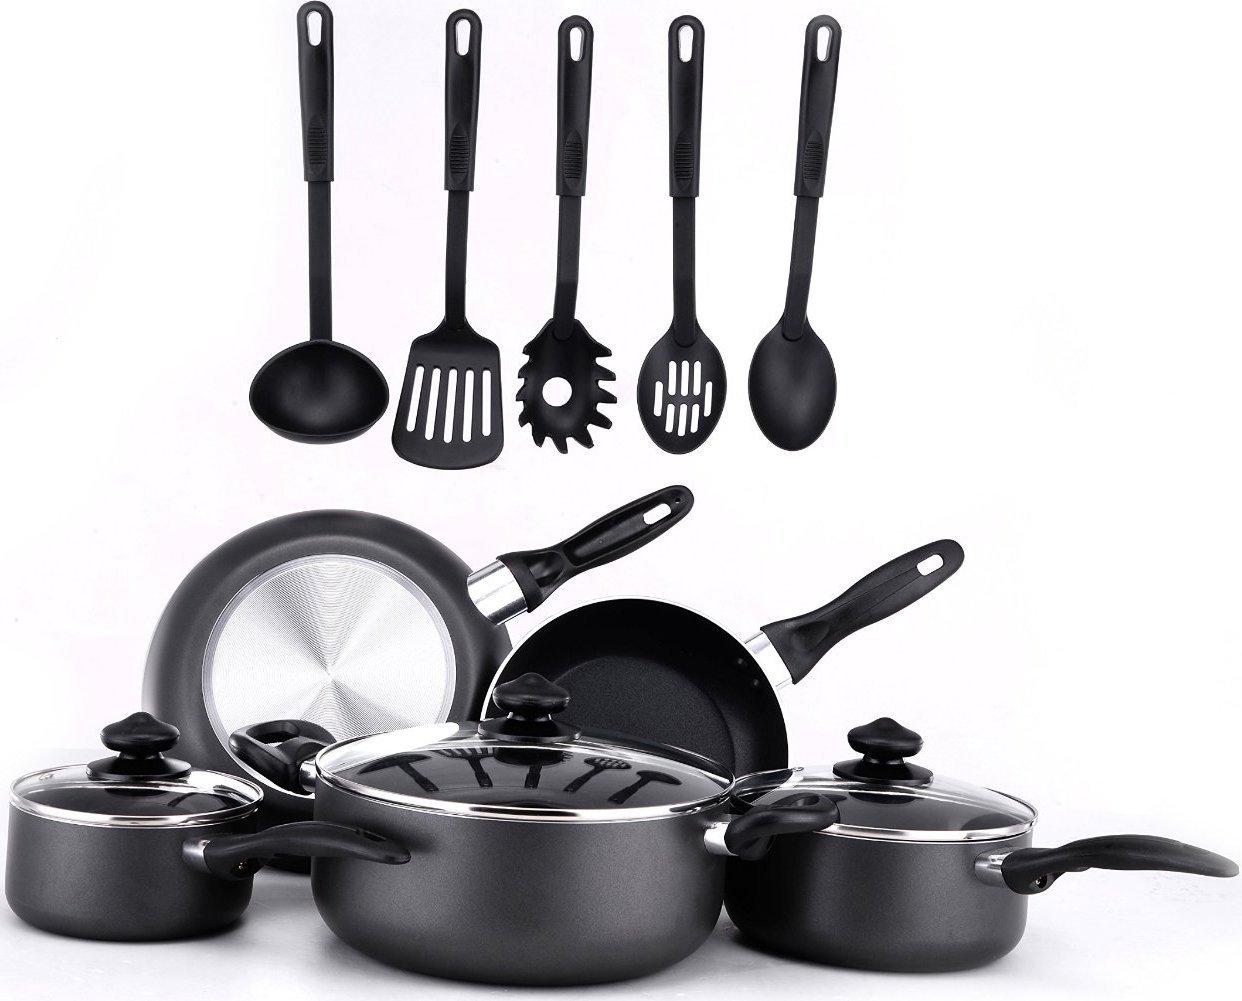 Amazon.com: 13 Pieces Kitchen Cookware Set - Black, Highly Durable ...